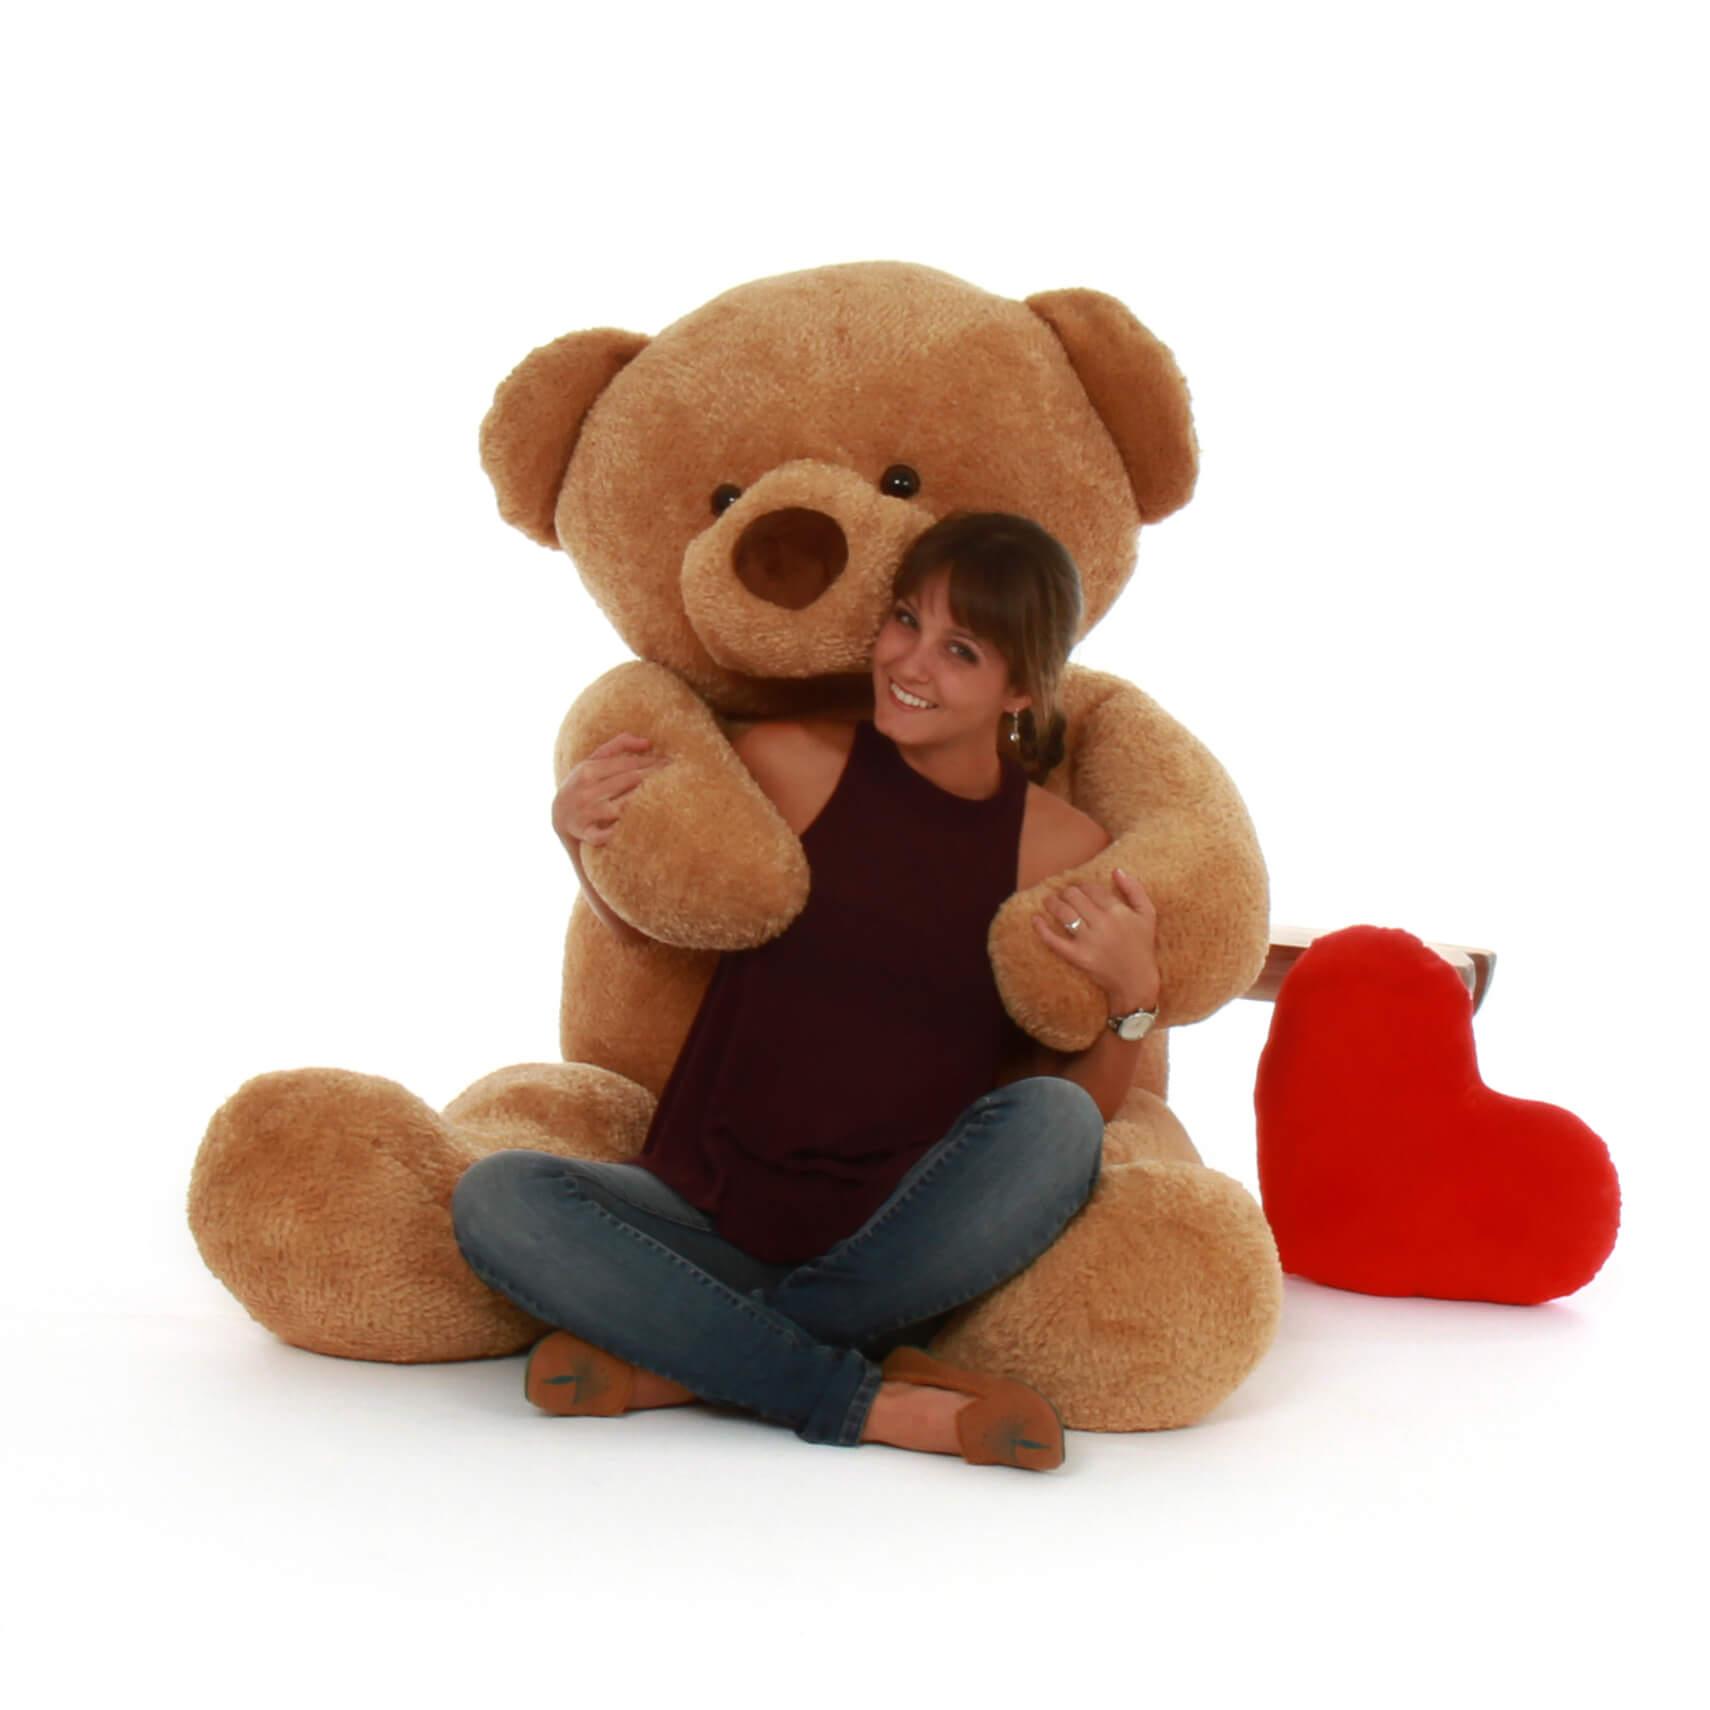 giant-teddy-bear-6ft-cutie-chubs-soft-and-huggable-adorable-life-size-amber-fur-1.jpg